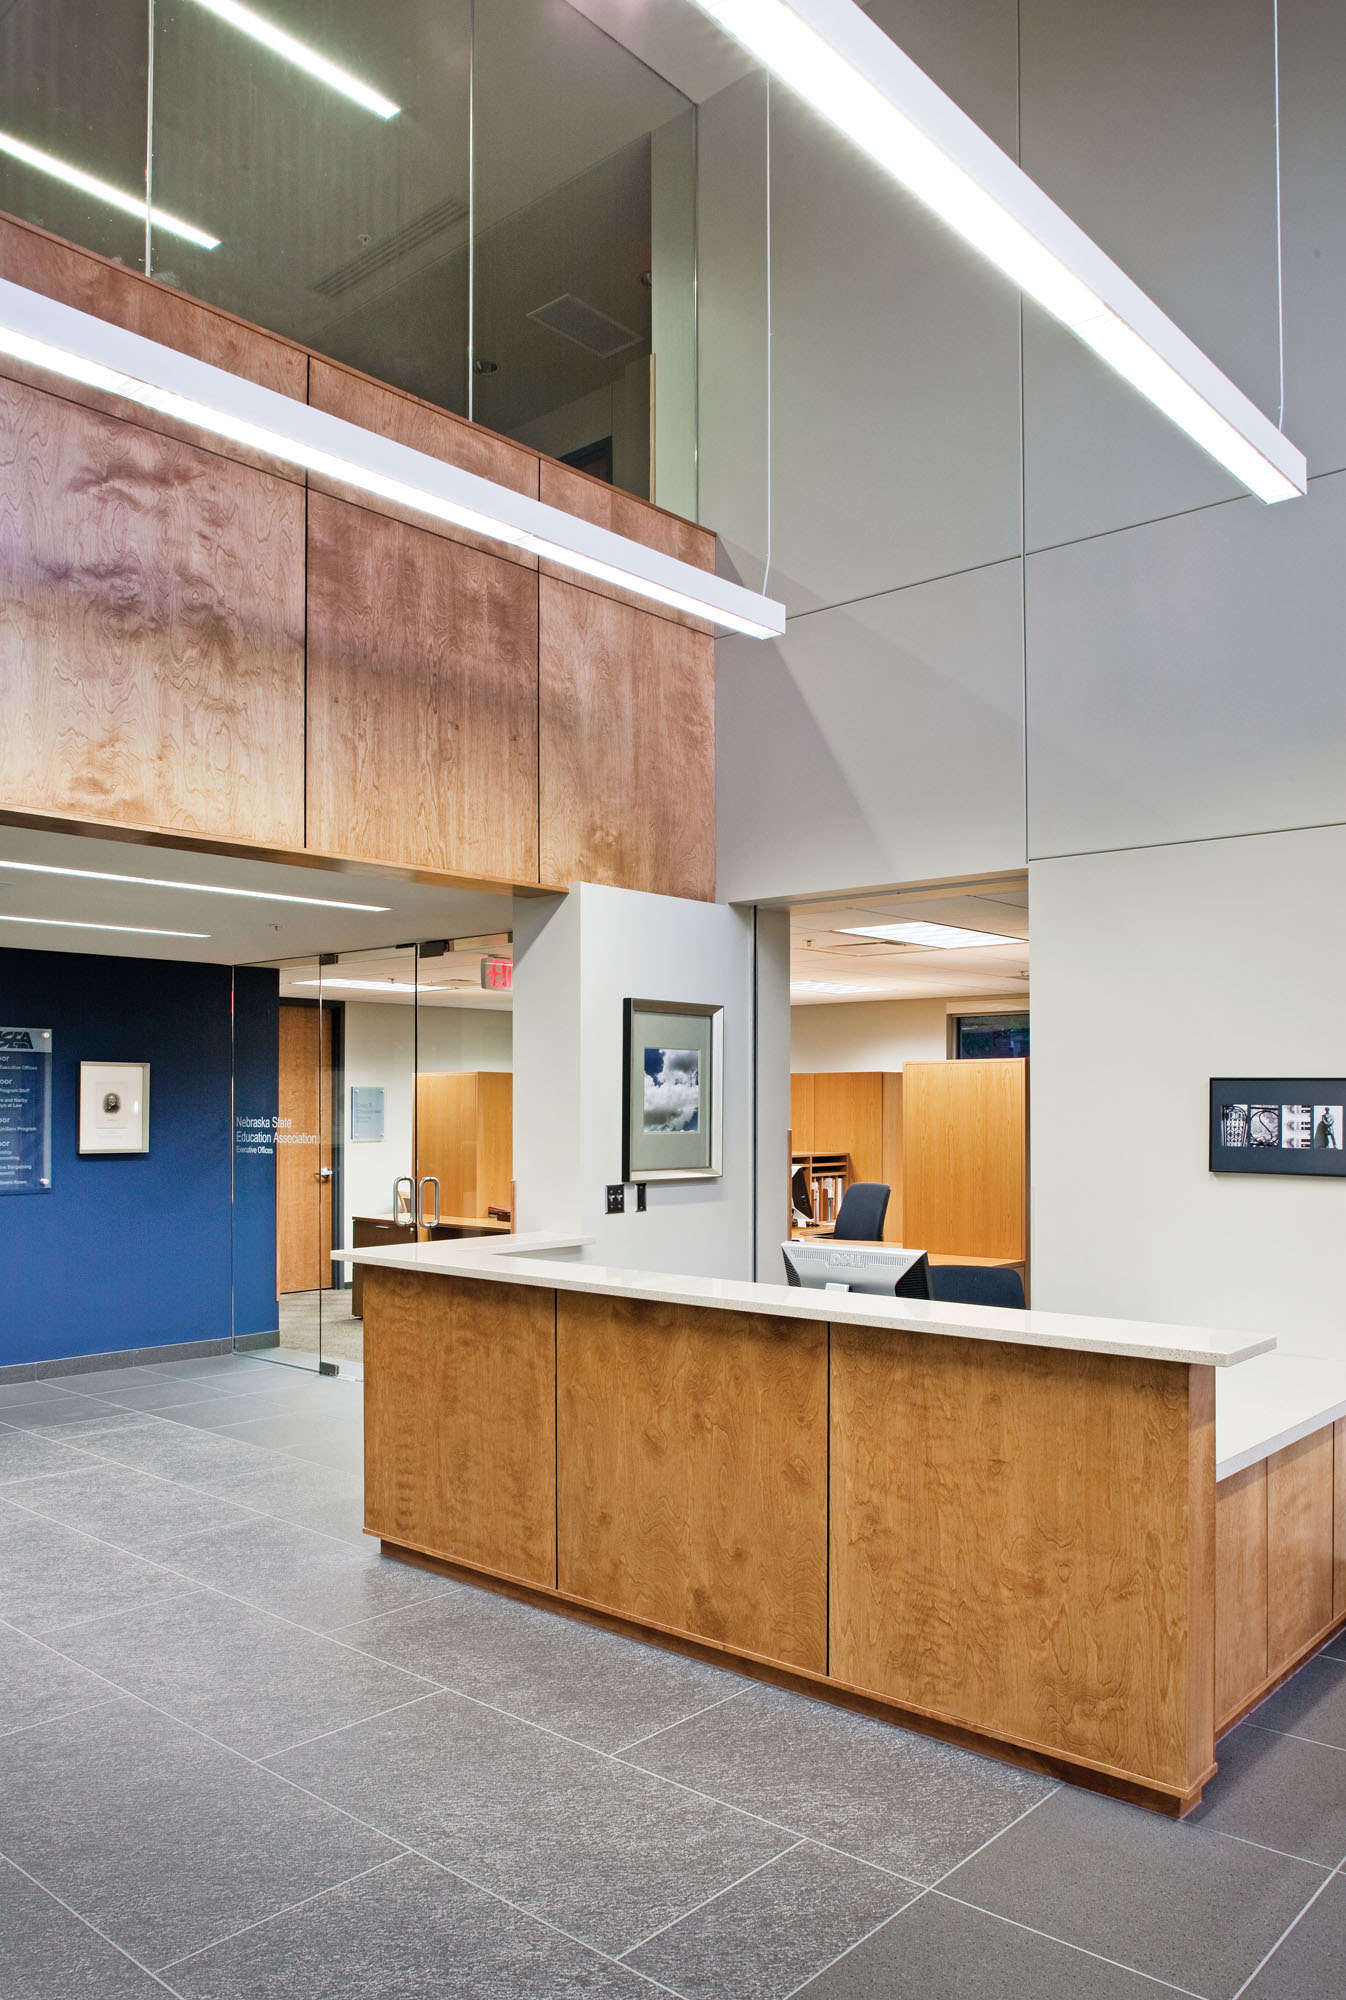 Nebraska State Education Association Office Building Renovation